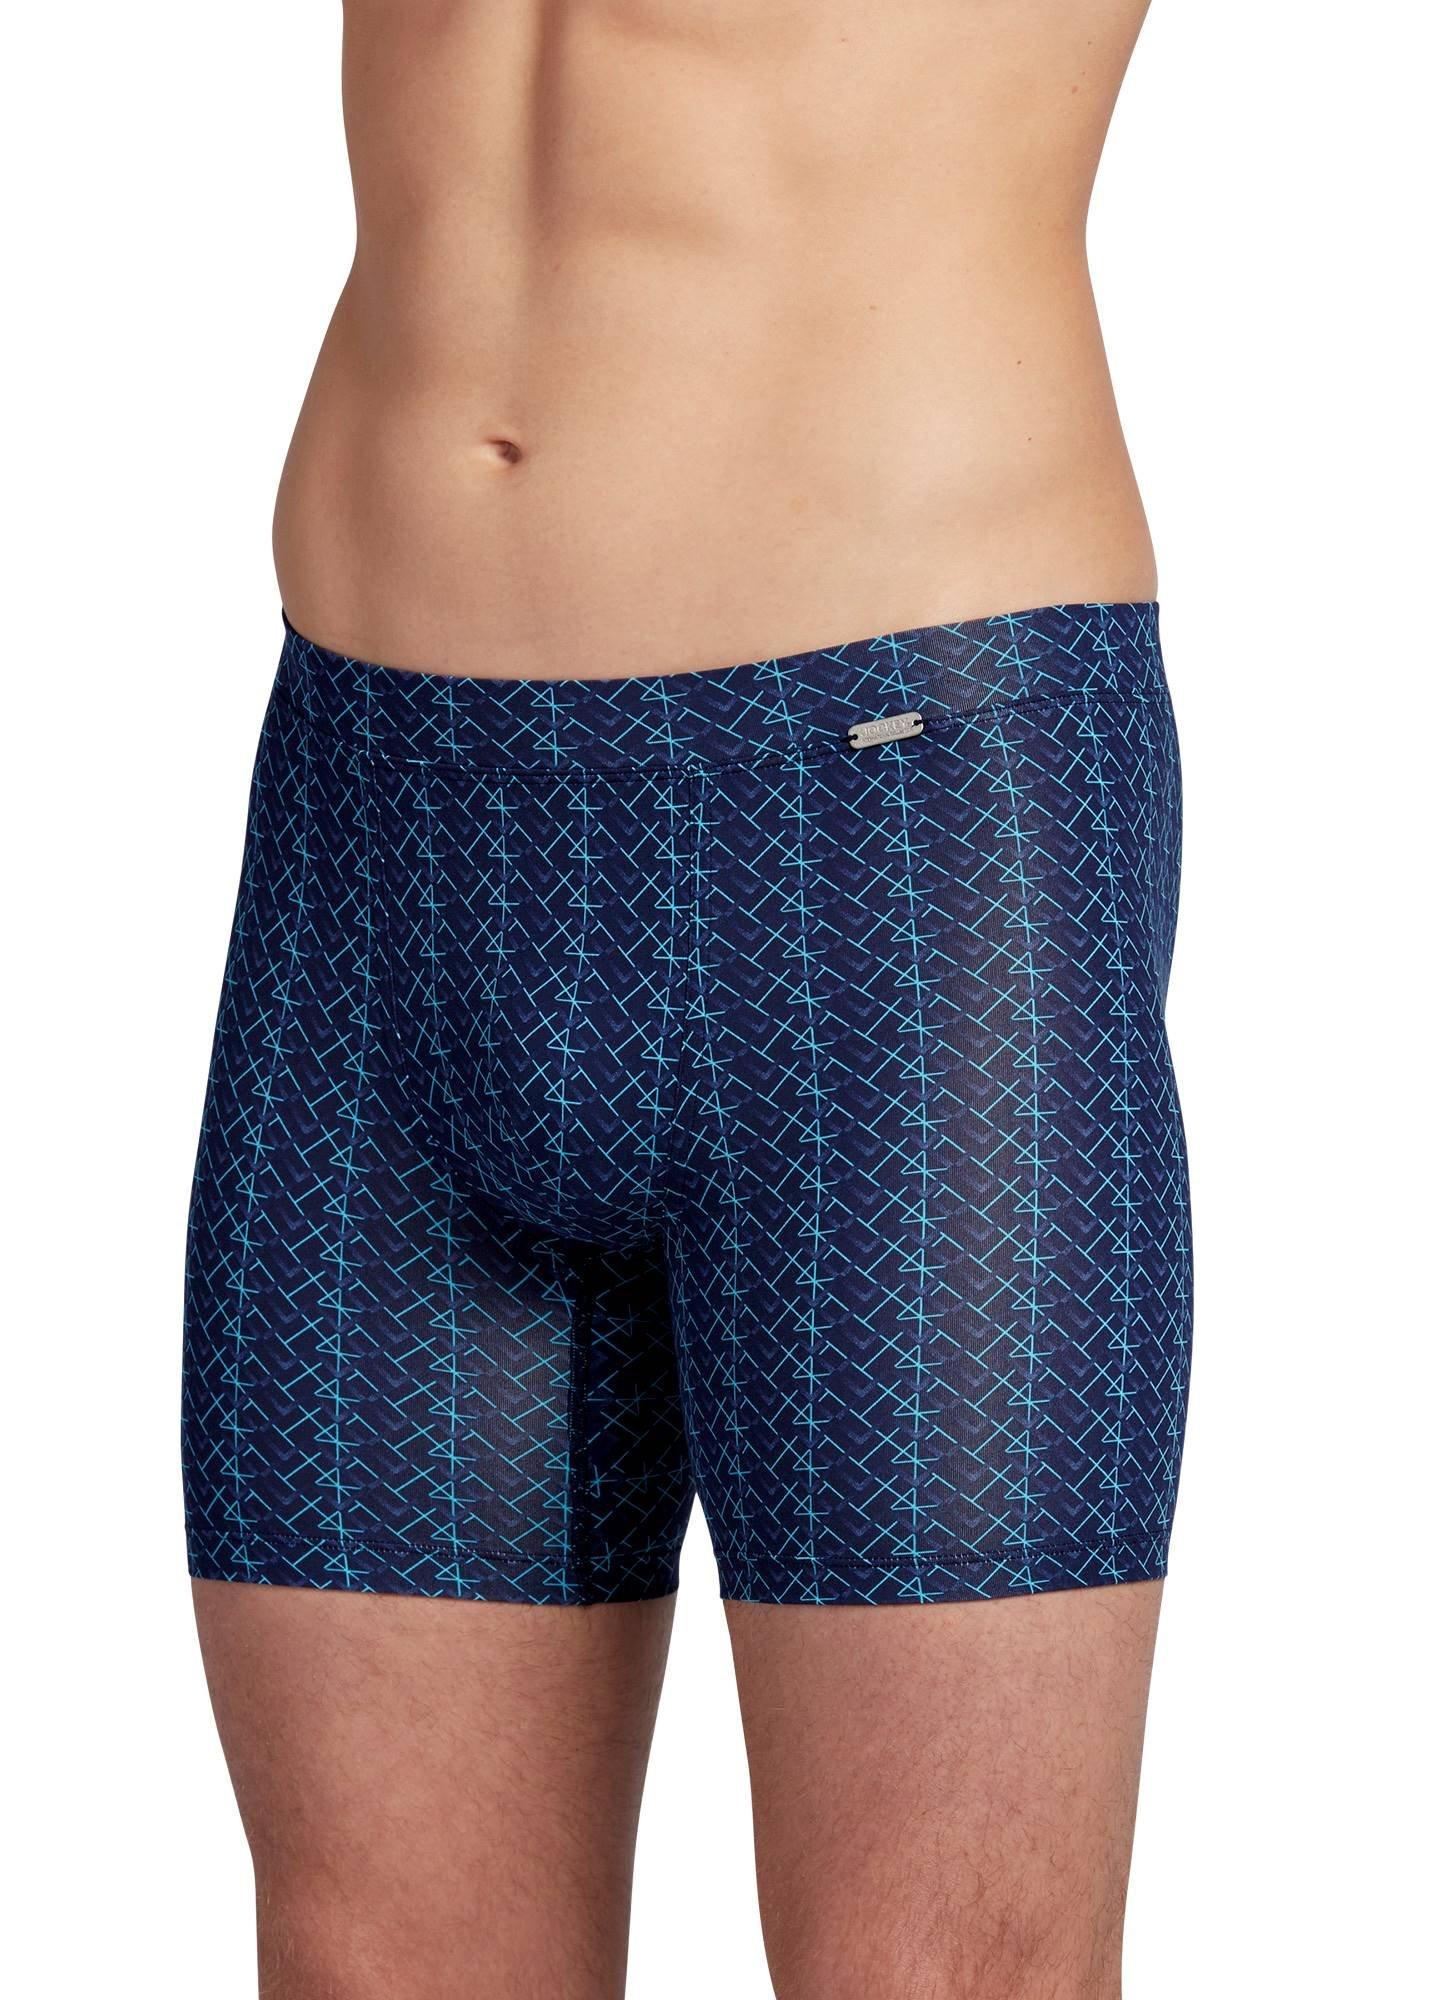 Jockey Men's Underwear Travel Microfiber Boxer Brief, Eclipse, L